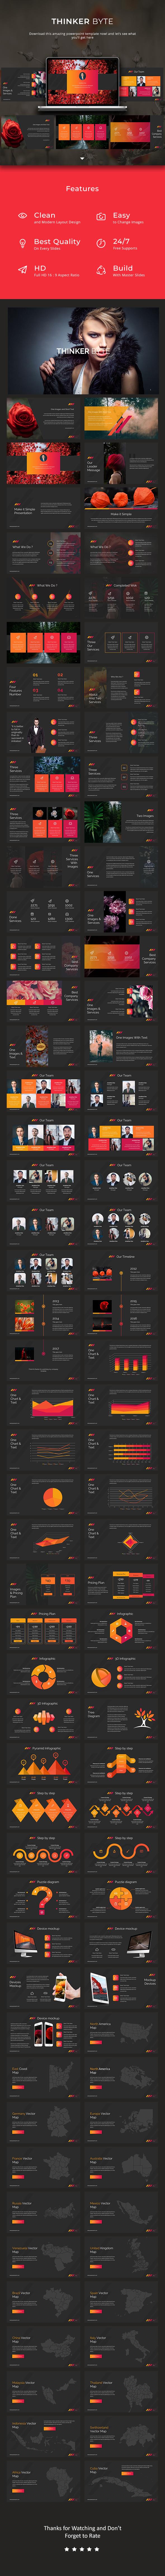 Thinker Byte Google Slides - Google Slides Presentation Templates